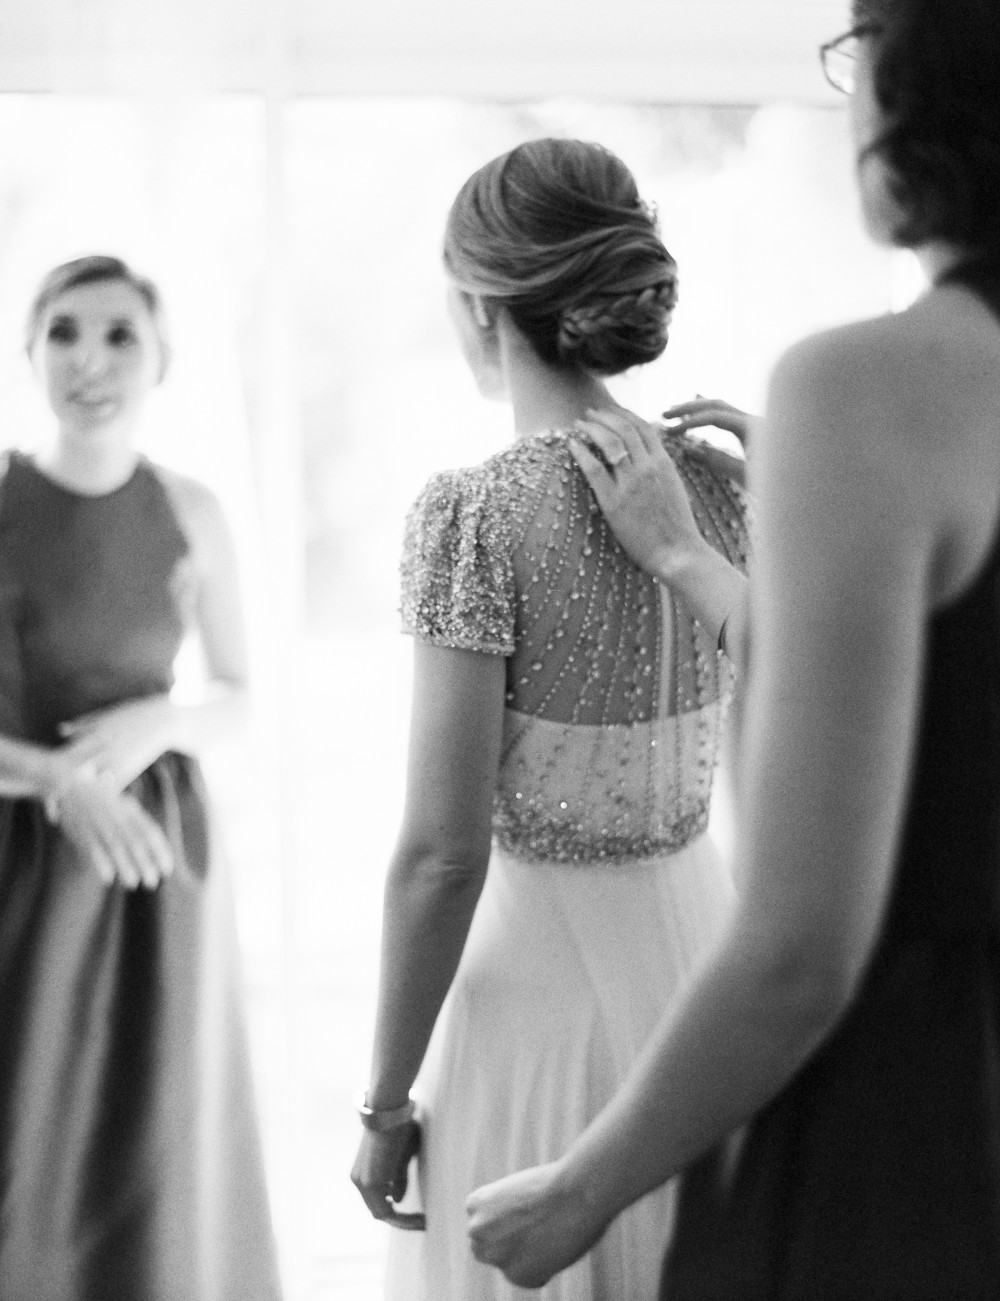 - Make Me Bridal Artist: Carolanne Armstrong Hair and Makeup. Photography by: Zosia Zacharia. #updo #hairup #braidedupdo #weddinghair #braids #vintage #glamourous #weddingmorning